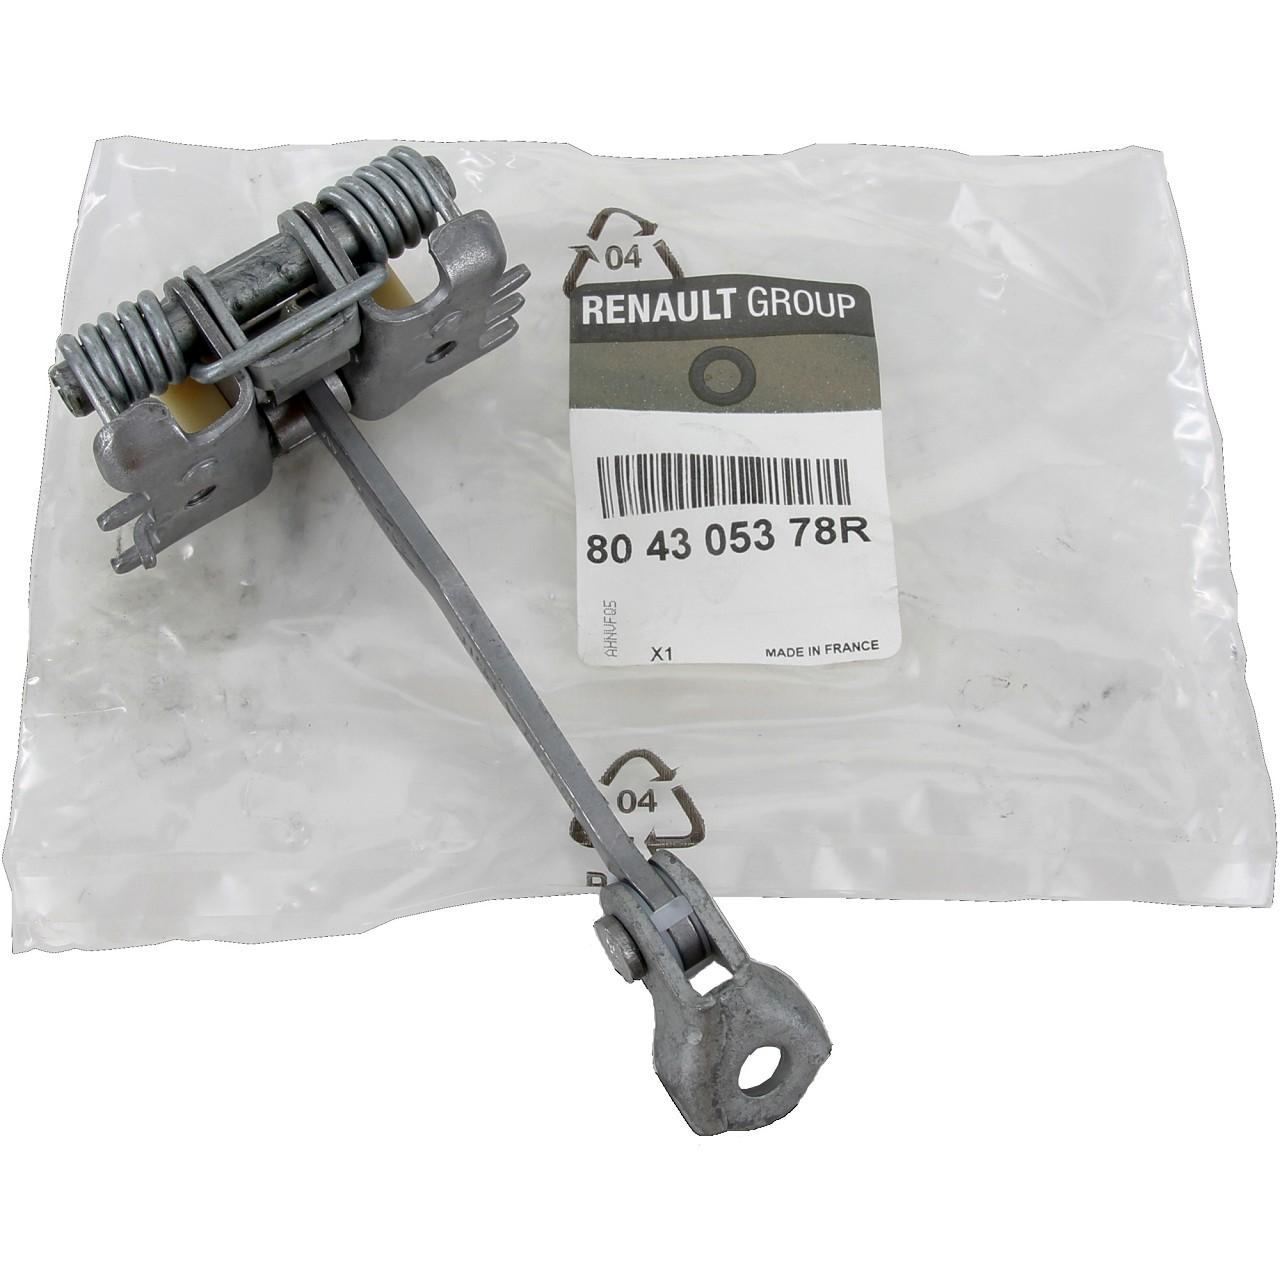 ORIGINAL Renault Türfeststeller Türsteller Türhalteband Türfangband 804305378R